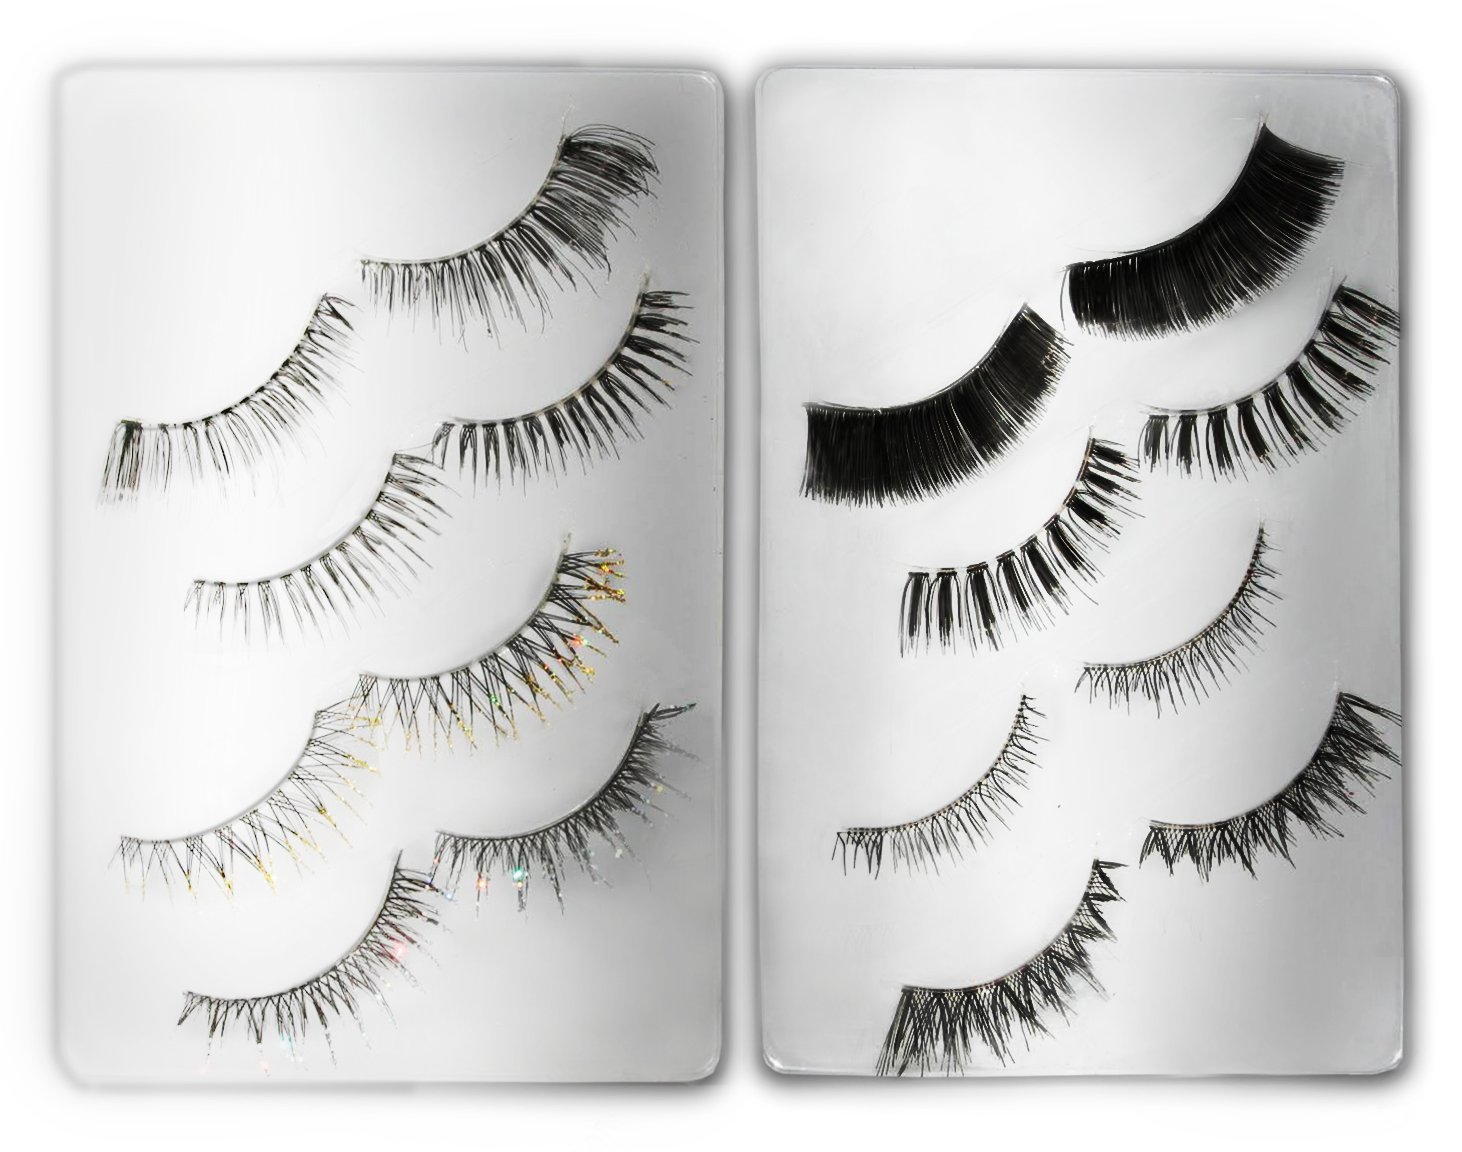 64d19a5cd9b Amazon.com : False Eyelashes 8 Flexi-band Lashes | Eyelash Extension Safe  Mascara | Hypoallergenic Lash Glue 1-2 Day Wear | Clear Lash Band Blends  with ...